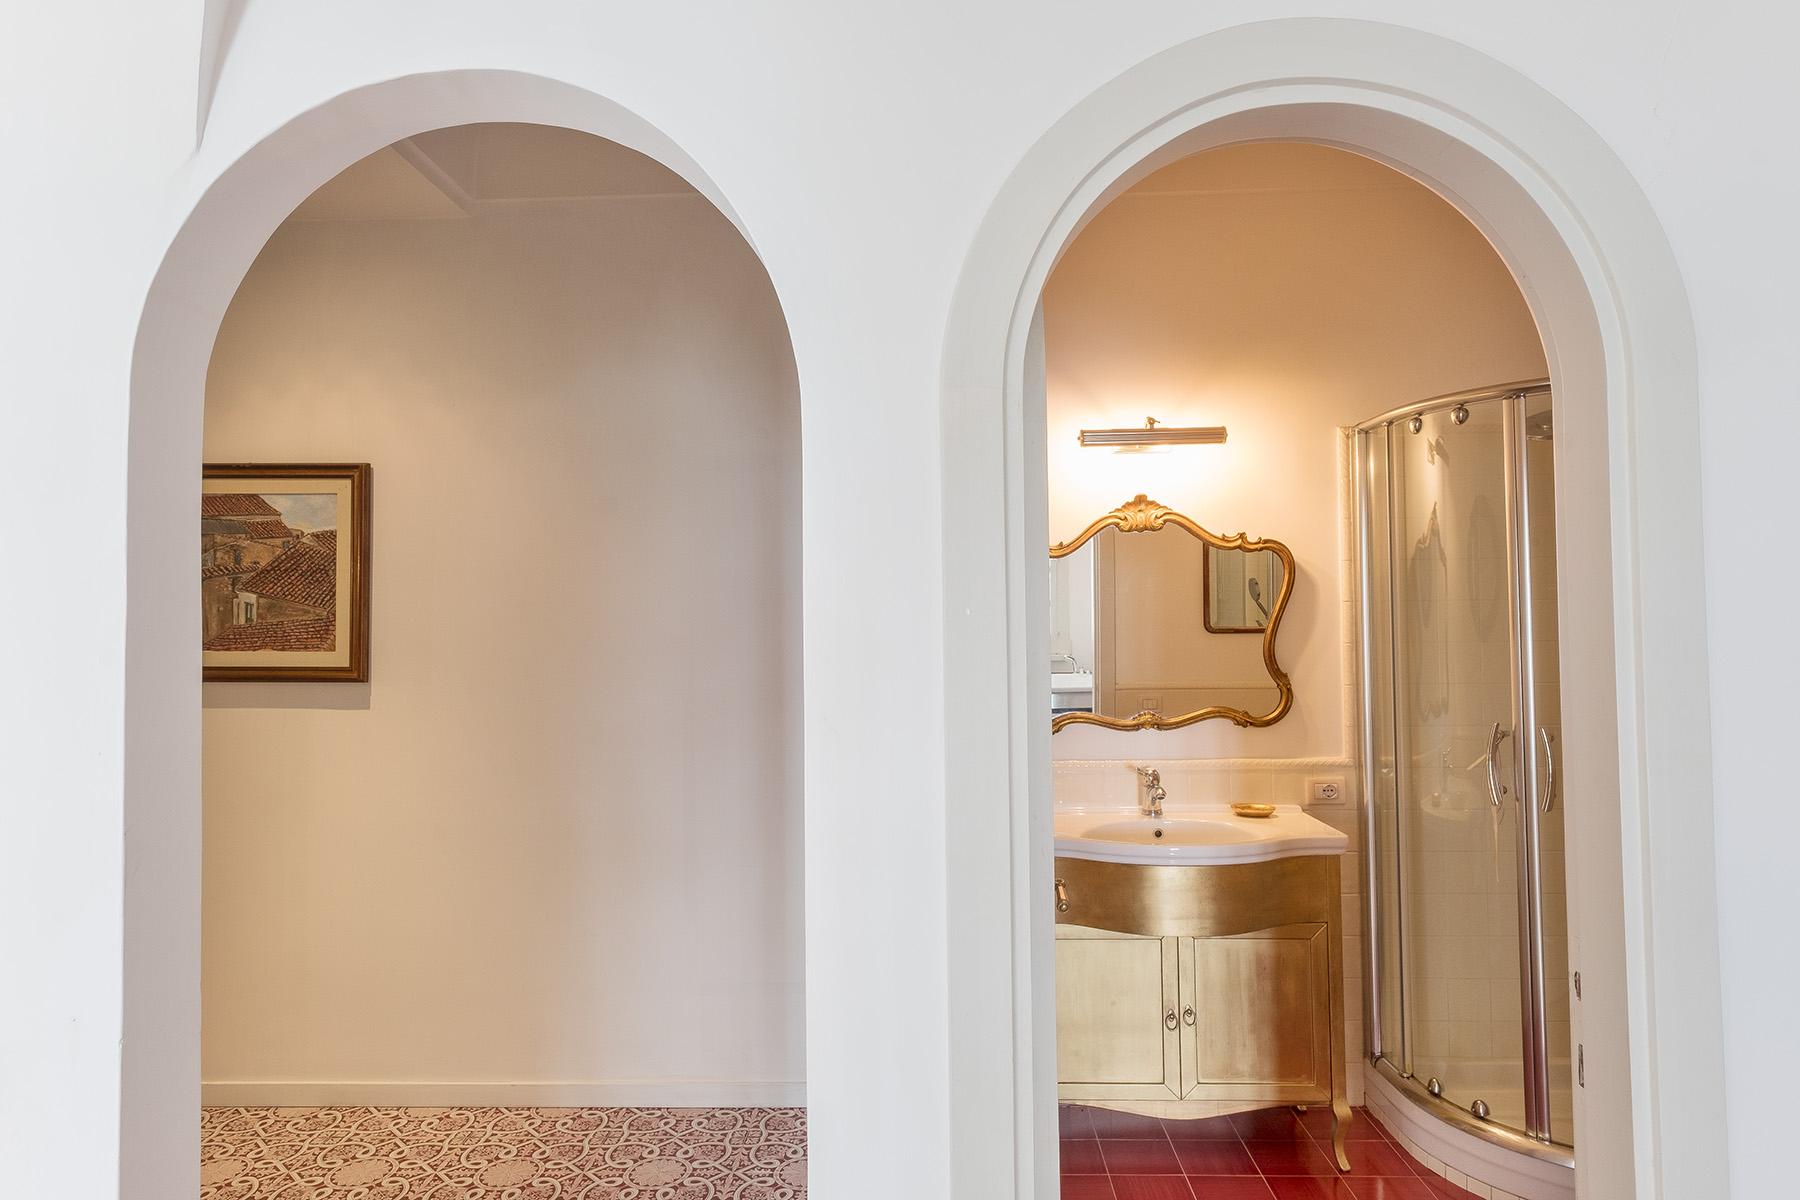 Casa indipendente in Vendita a Praiano: 4 locali, 250 mq - Foto 17